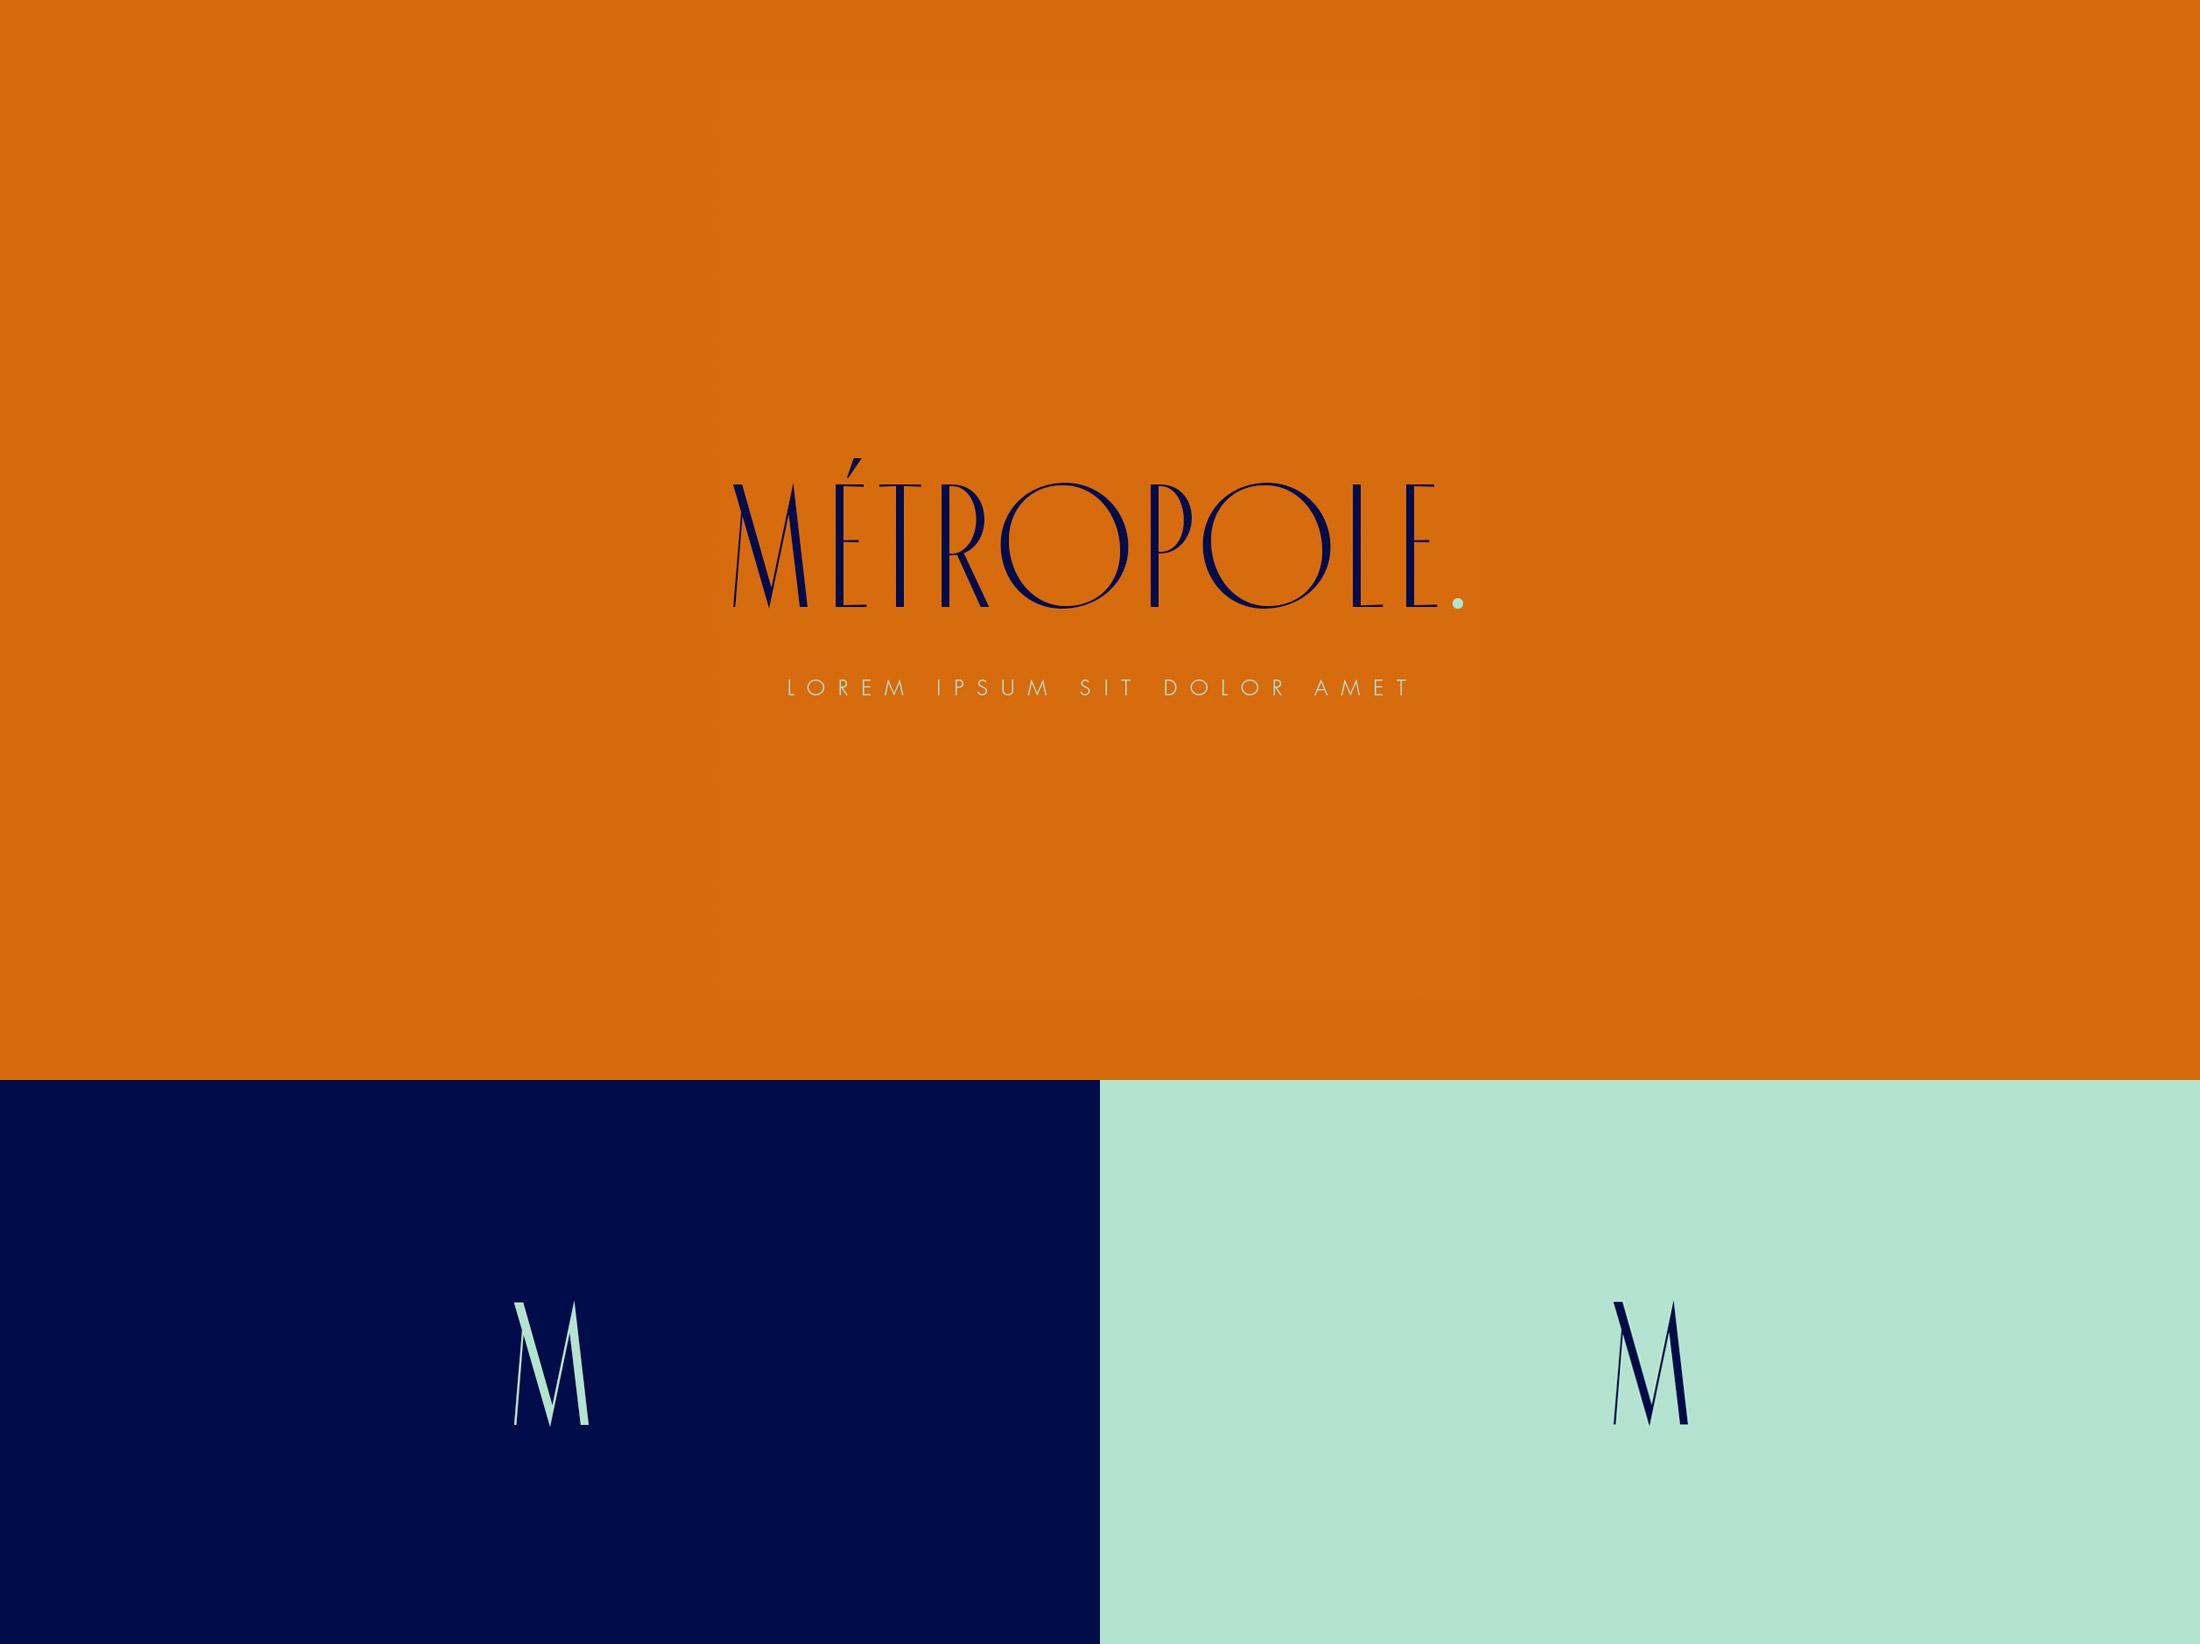 Metropole_image12